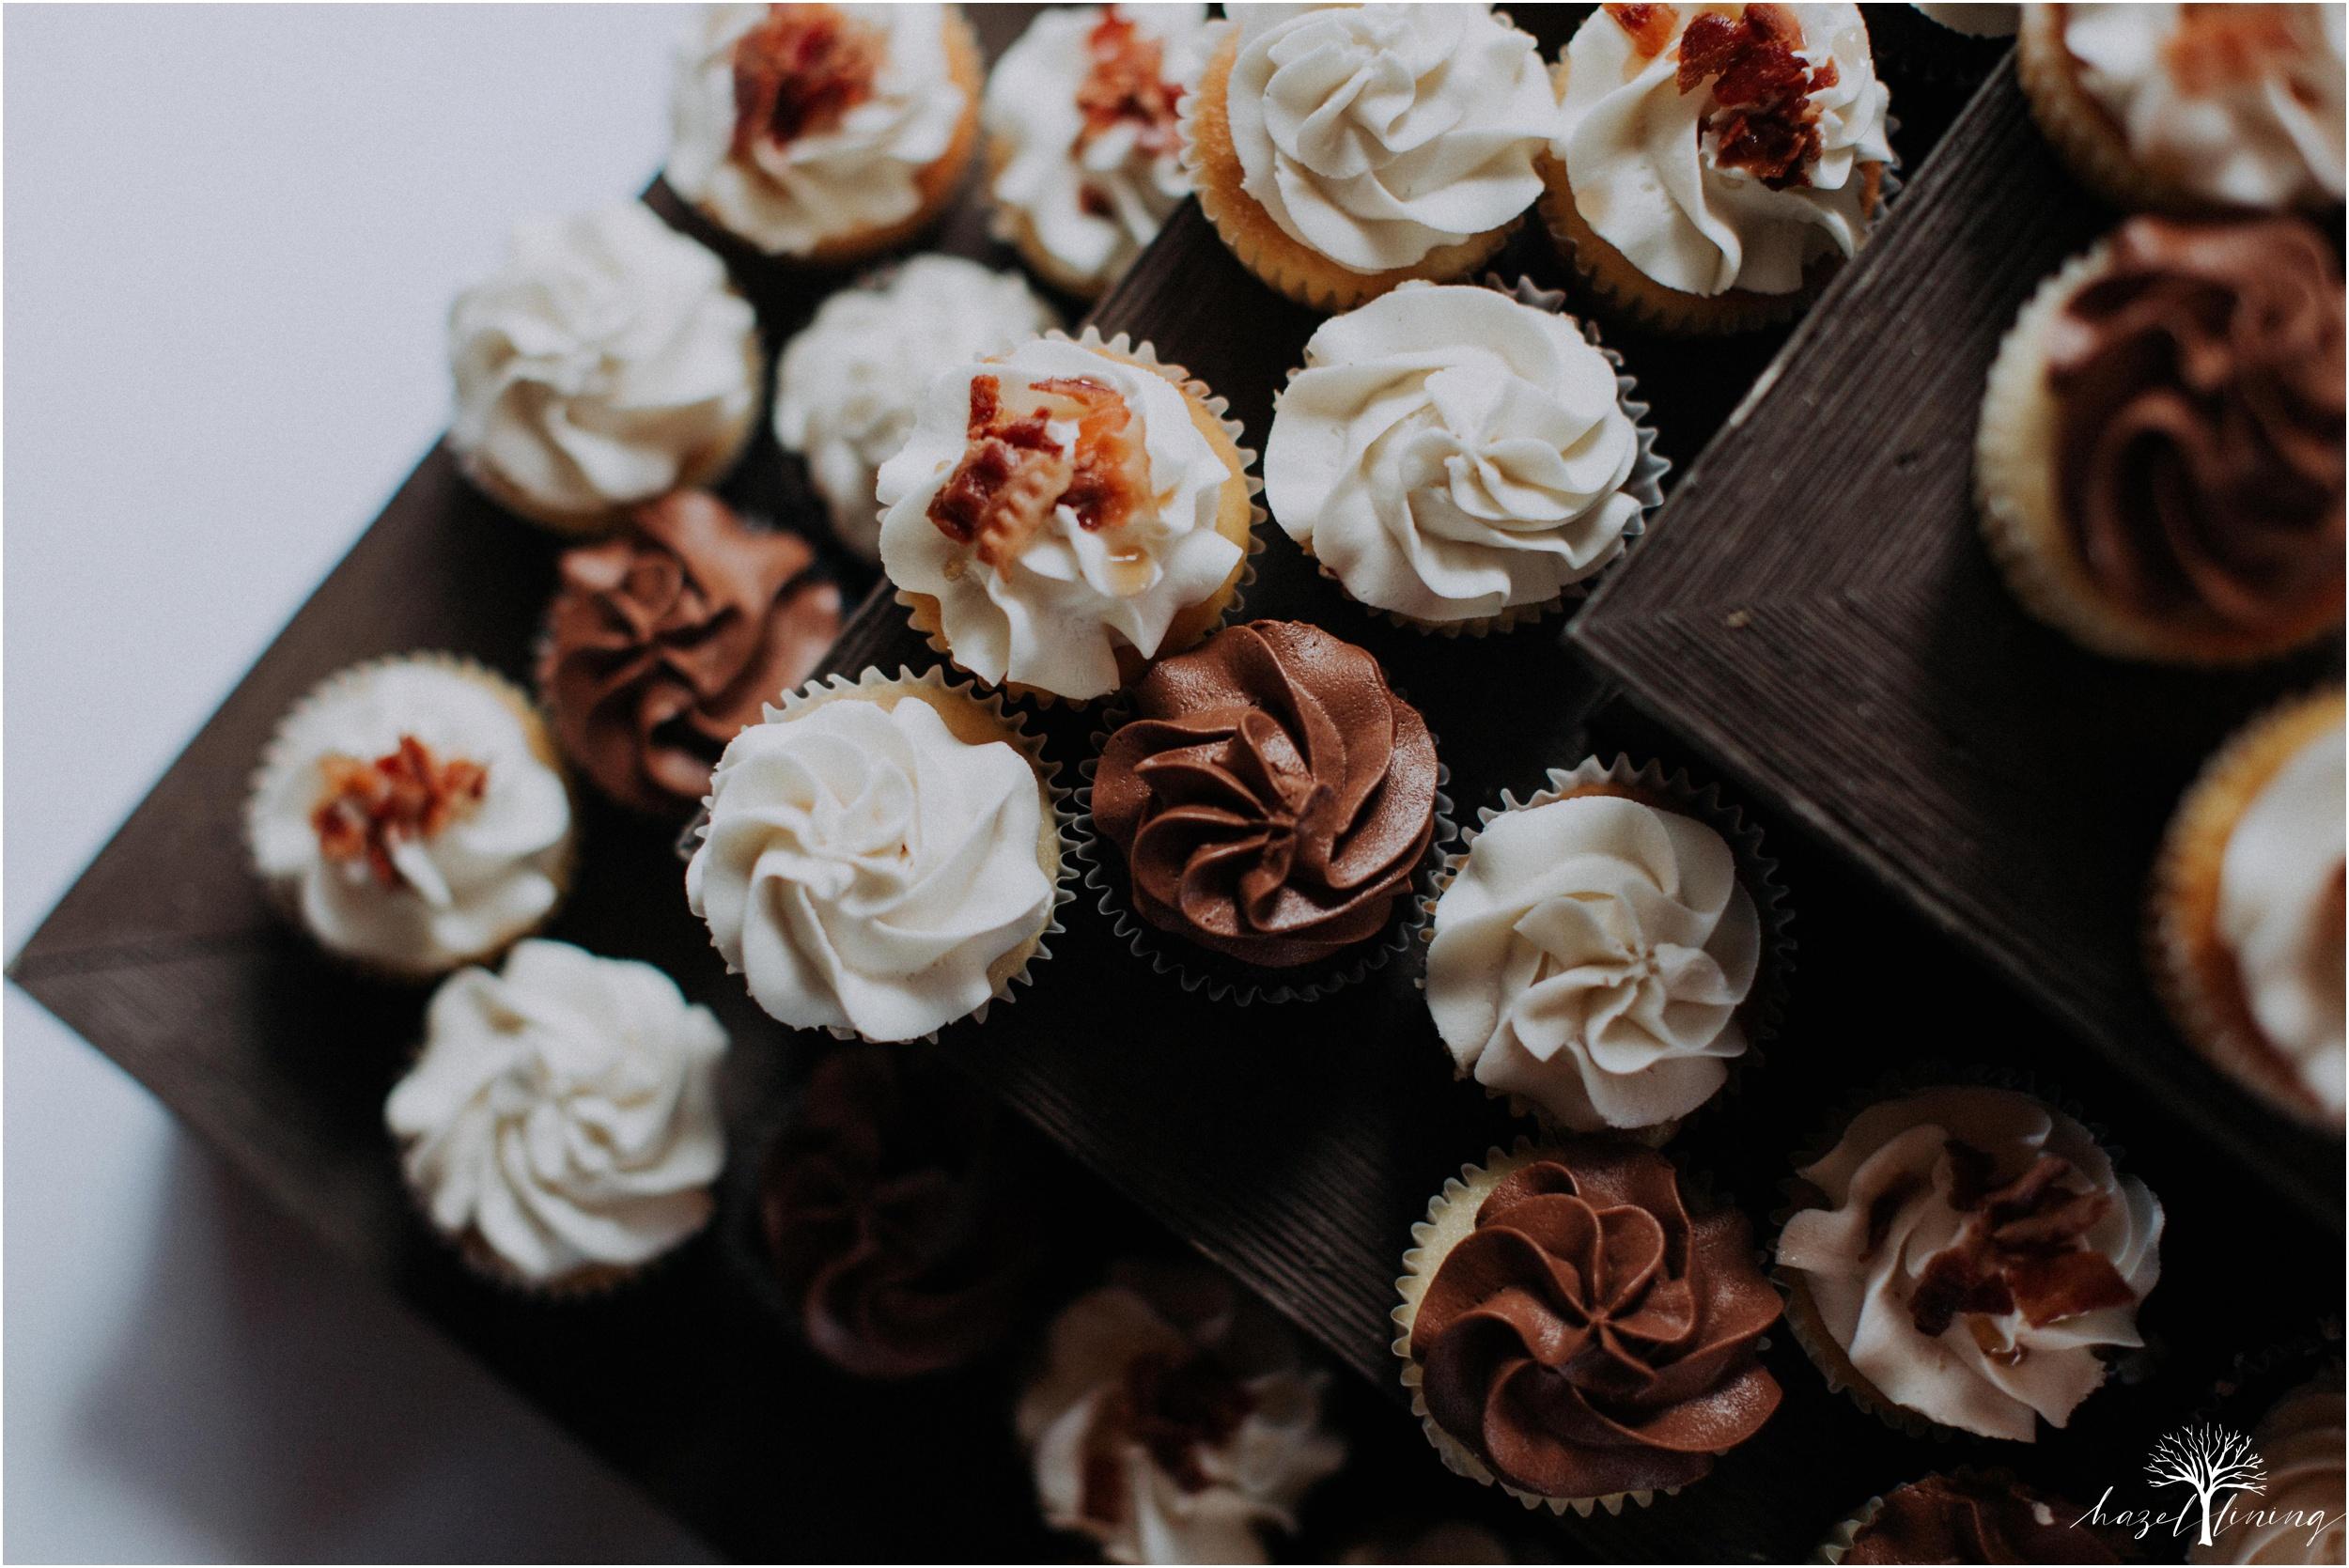 mariah-kreyling-samuel-sherratt-sherrattwiththeworld-peirce-farm-at-witch-hill-boston-massachusetts-wedding-photography-hazel-lining-travel-wedding-elopement-photography_0179.jpg